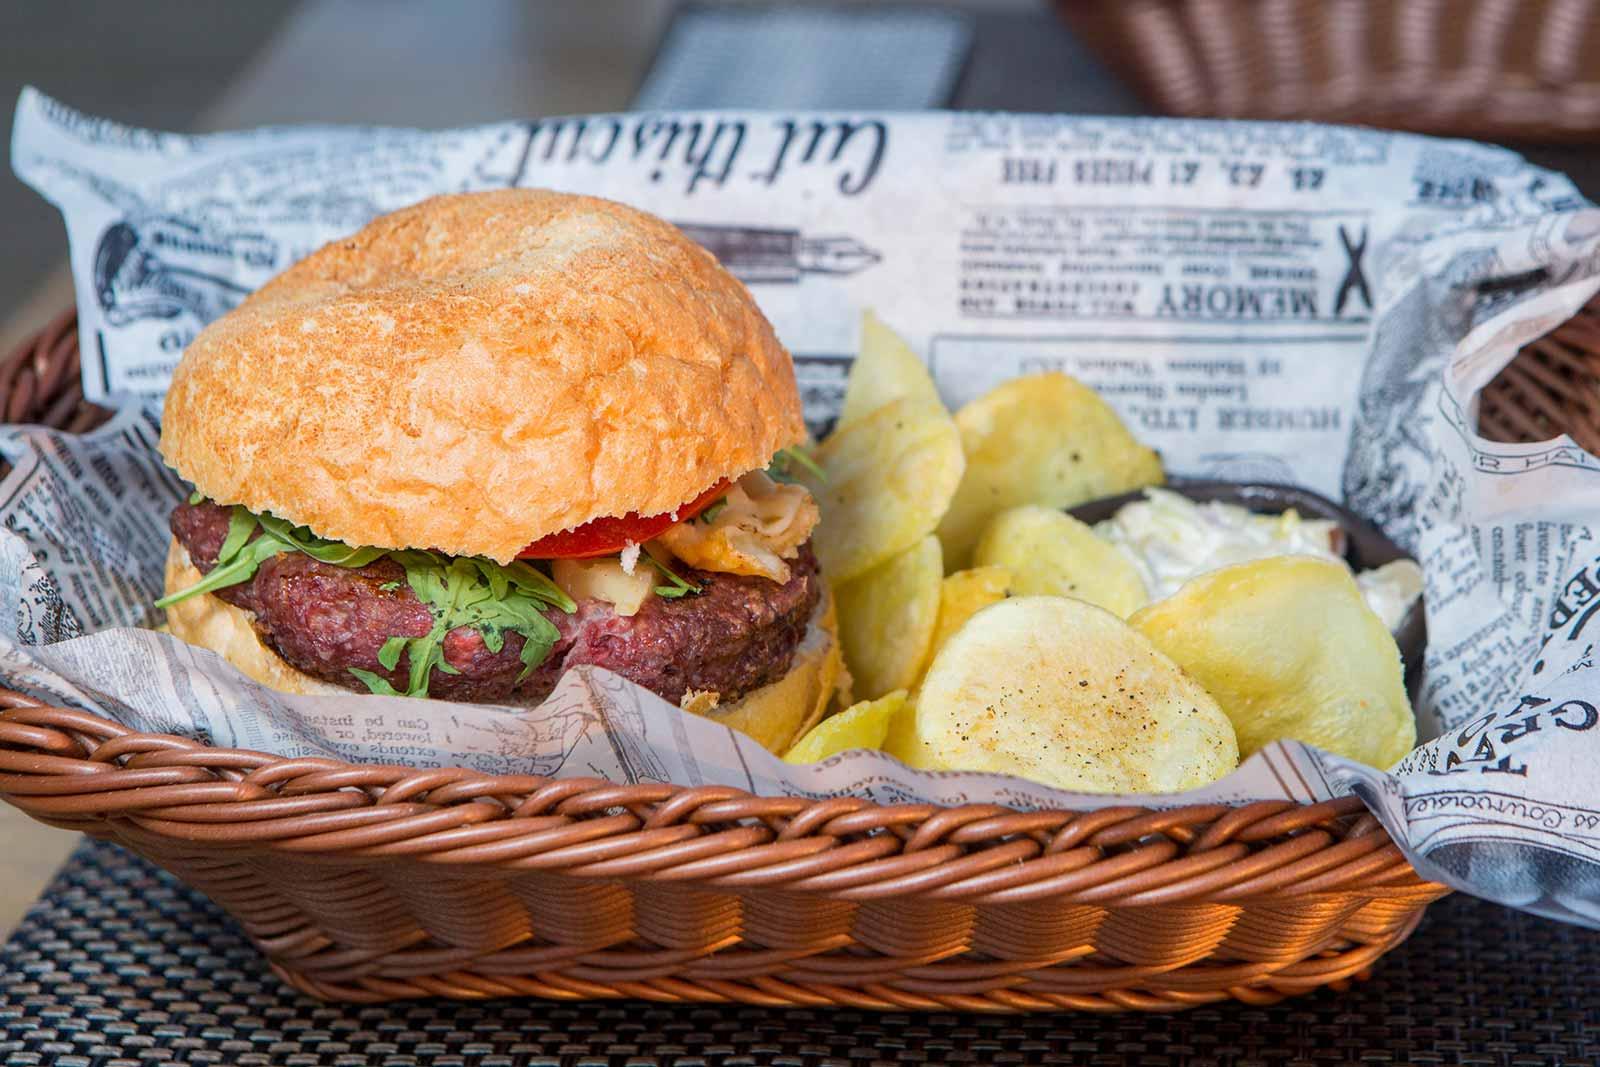 Foodtrailer-Mallorca-Foodtrailer-mobiles-Catering-Mallorca-4